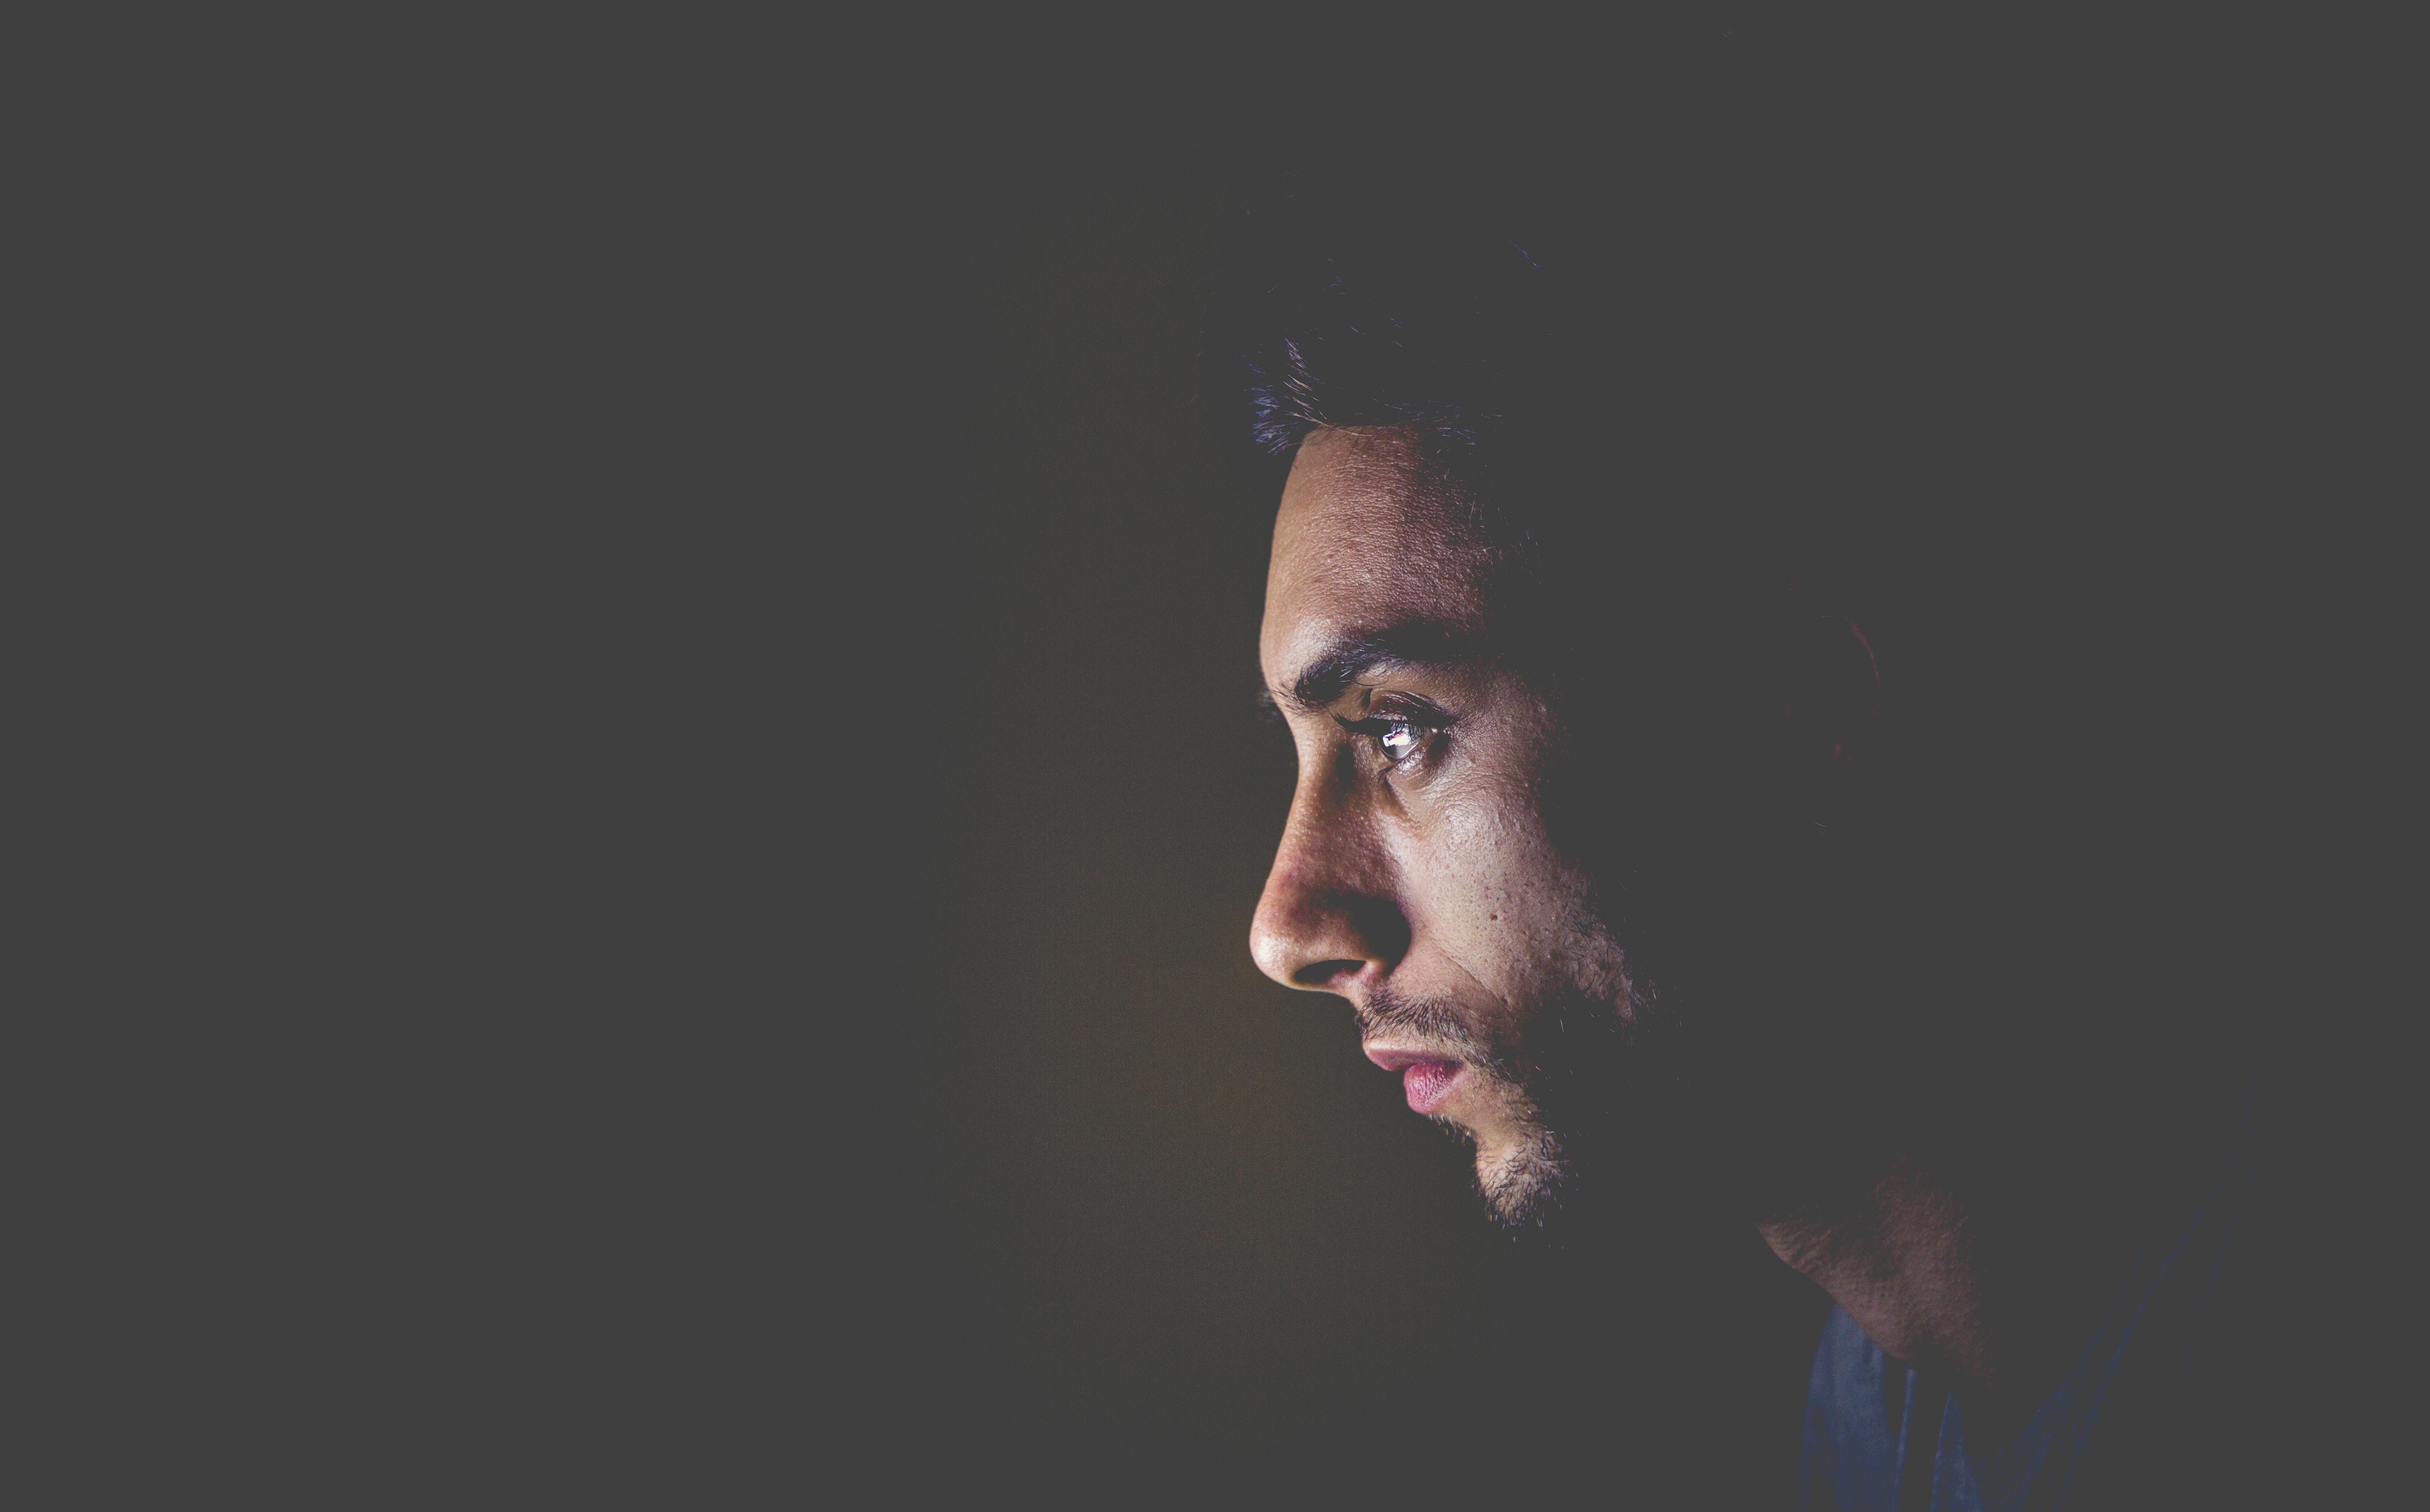 selective focus photo of man face